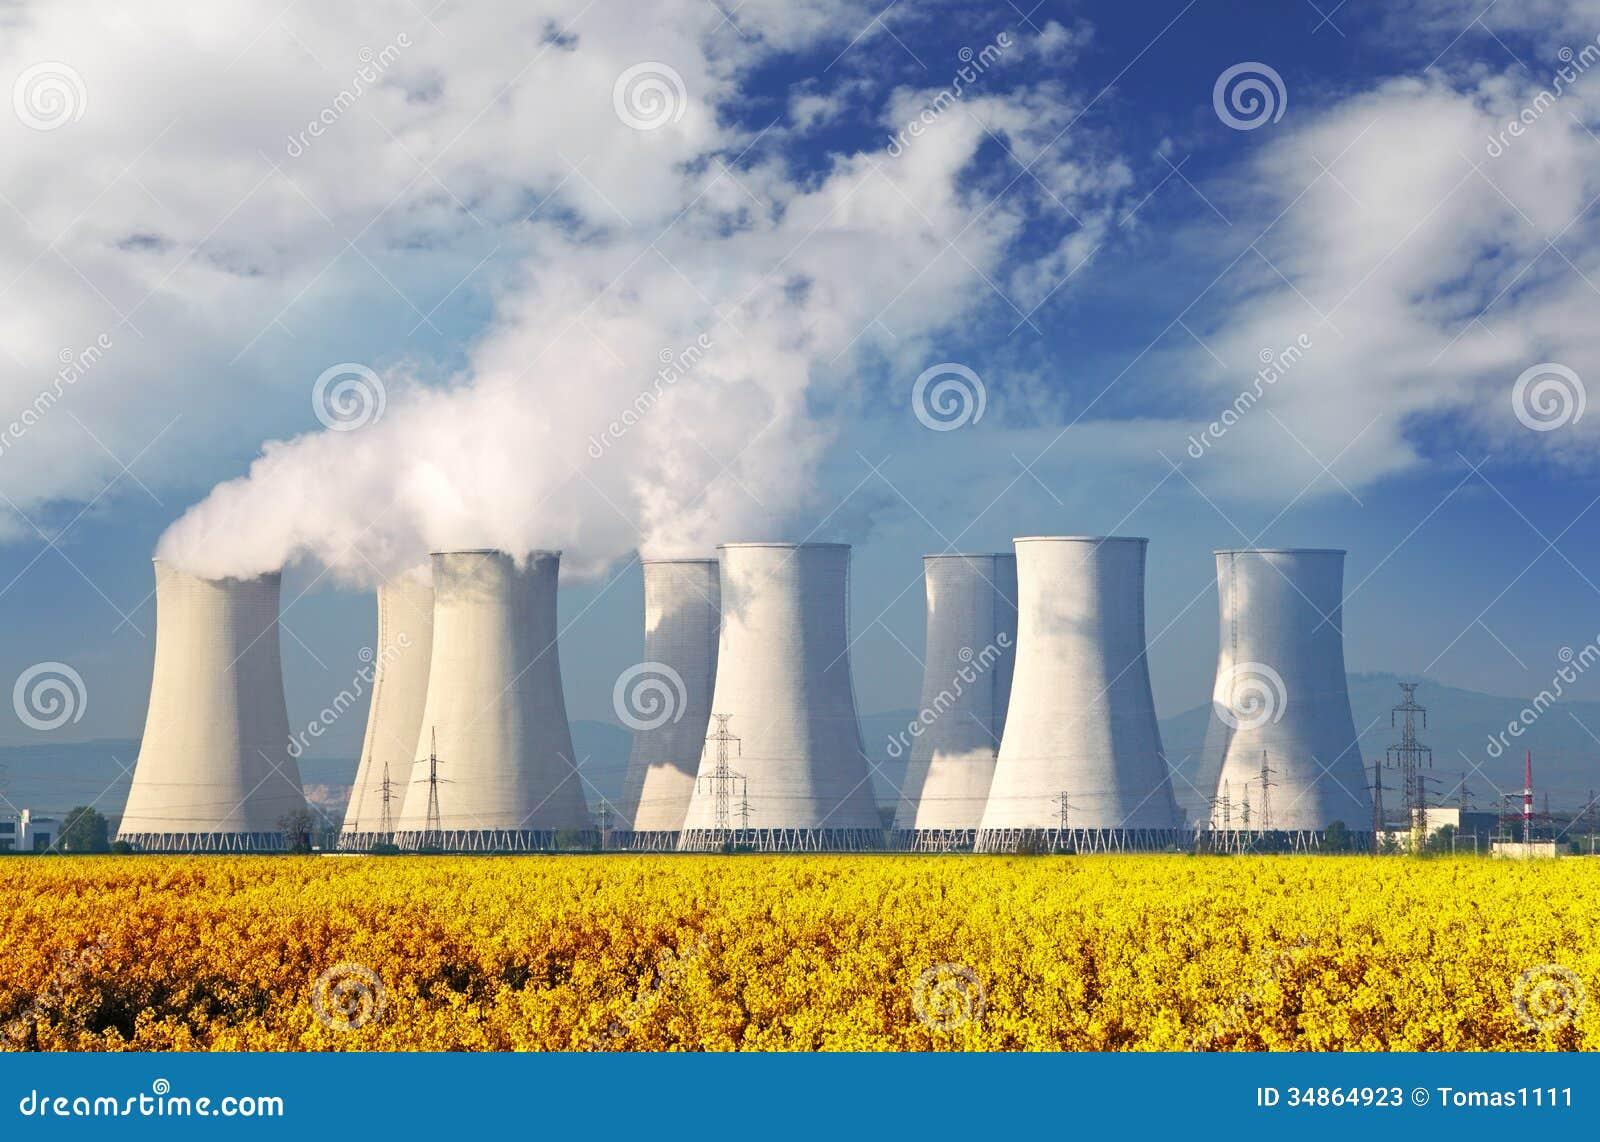 essays on nuclear power plants